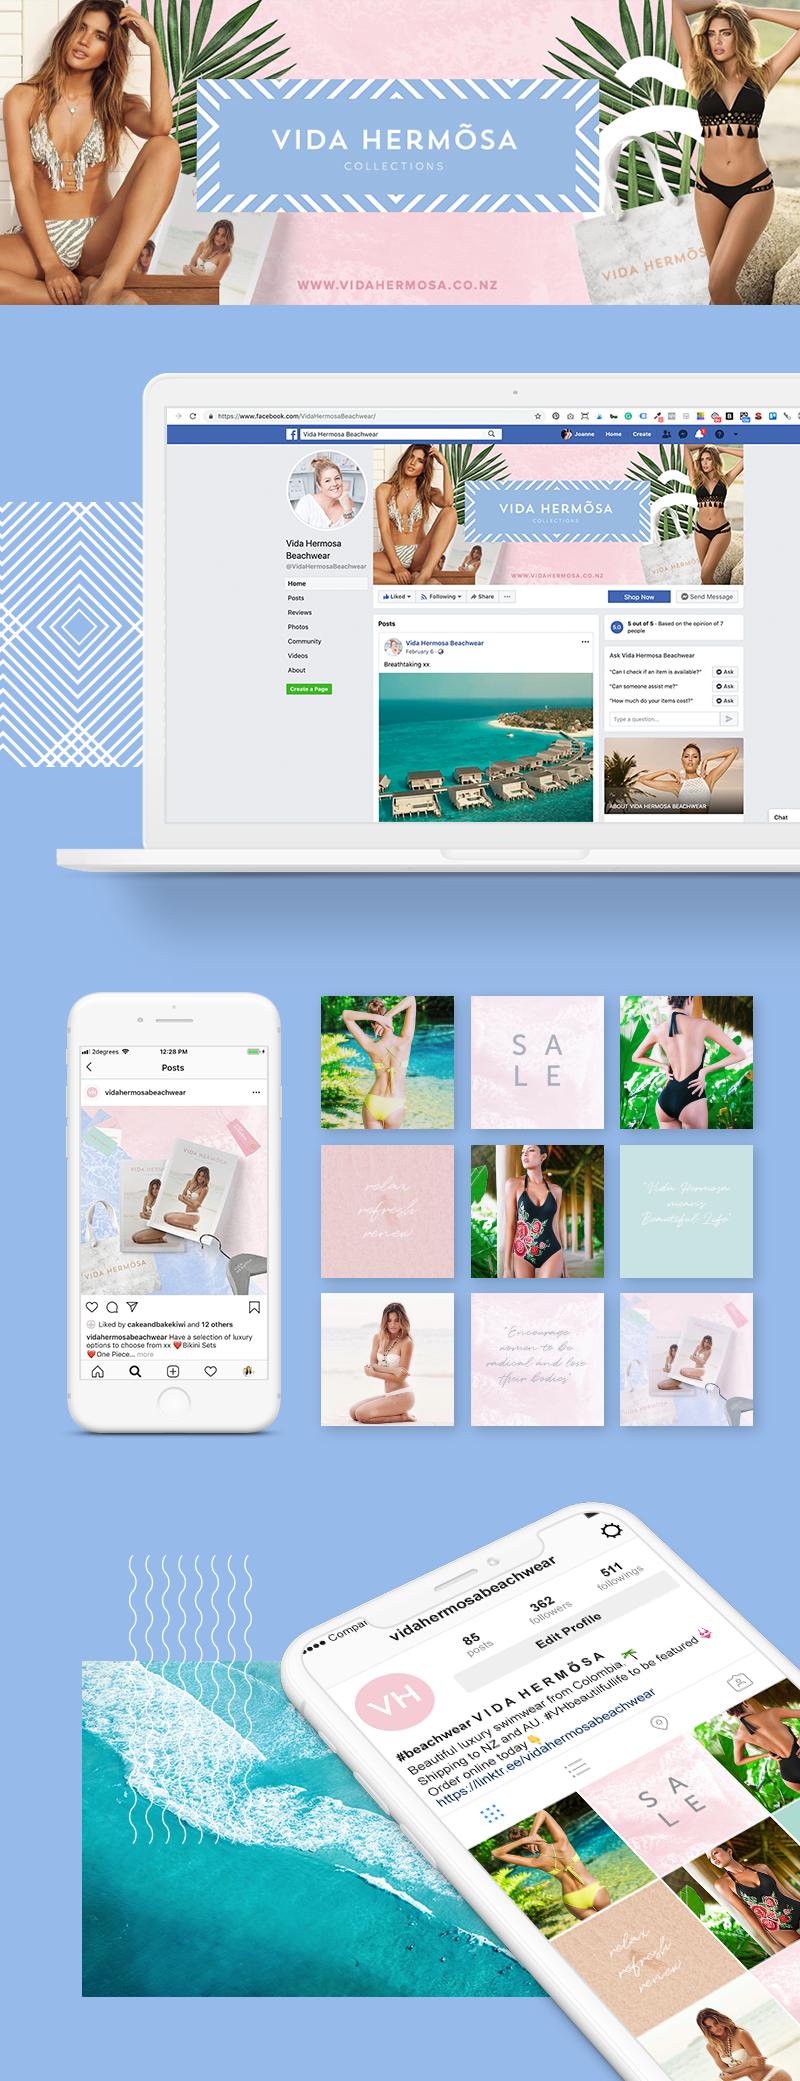 vida hermosa instagram social media kit simply whyte design branding squarespace web design auckland new zealand.png